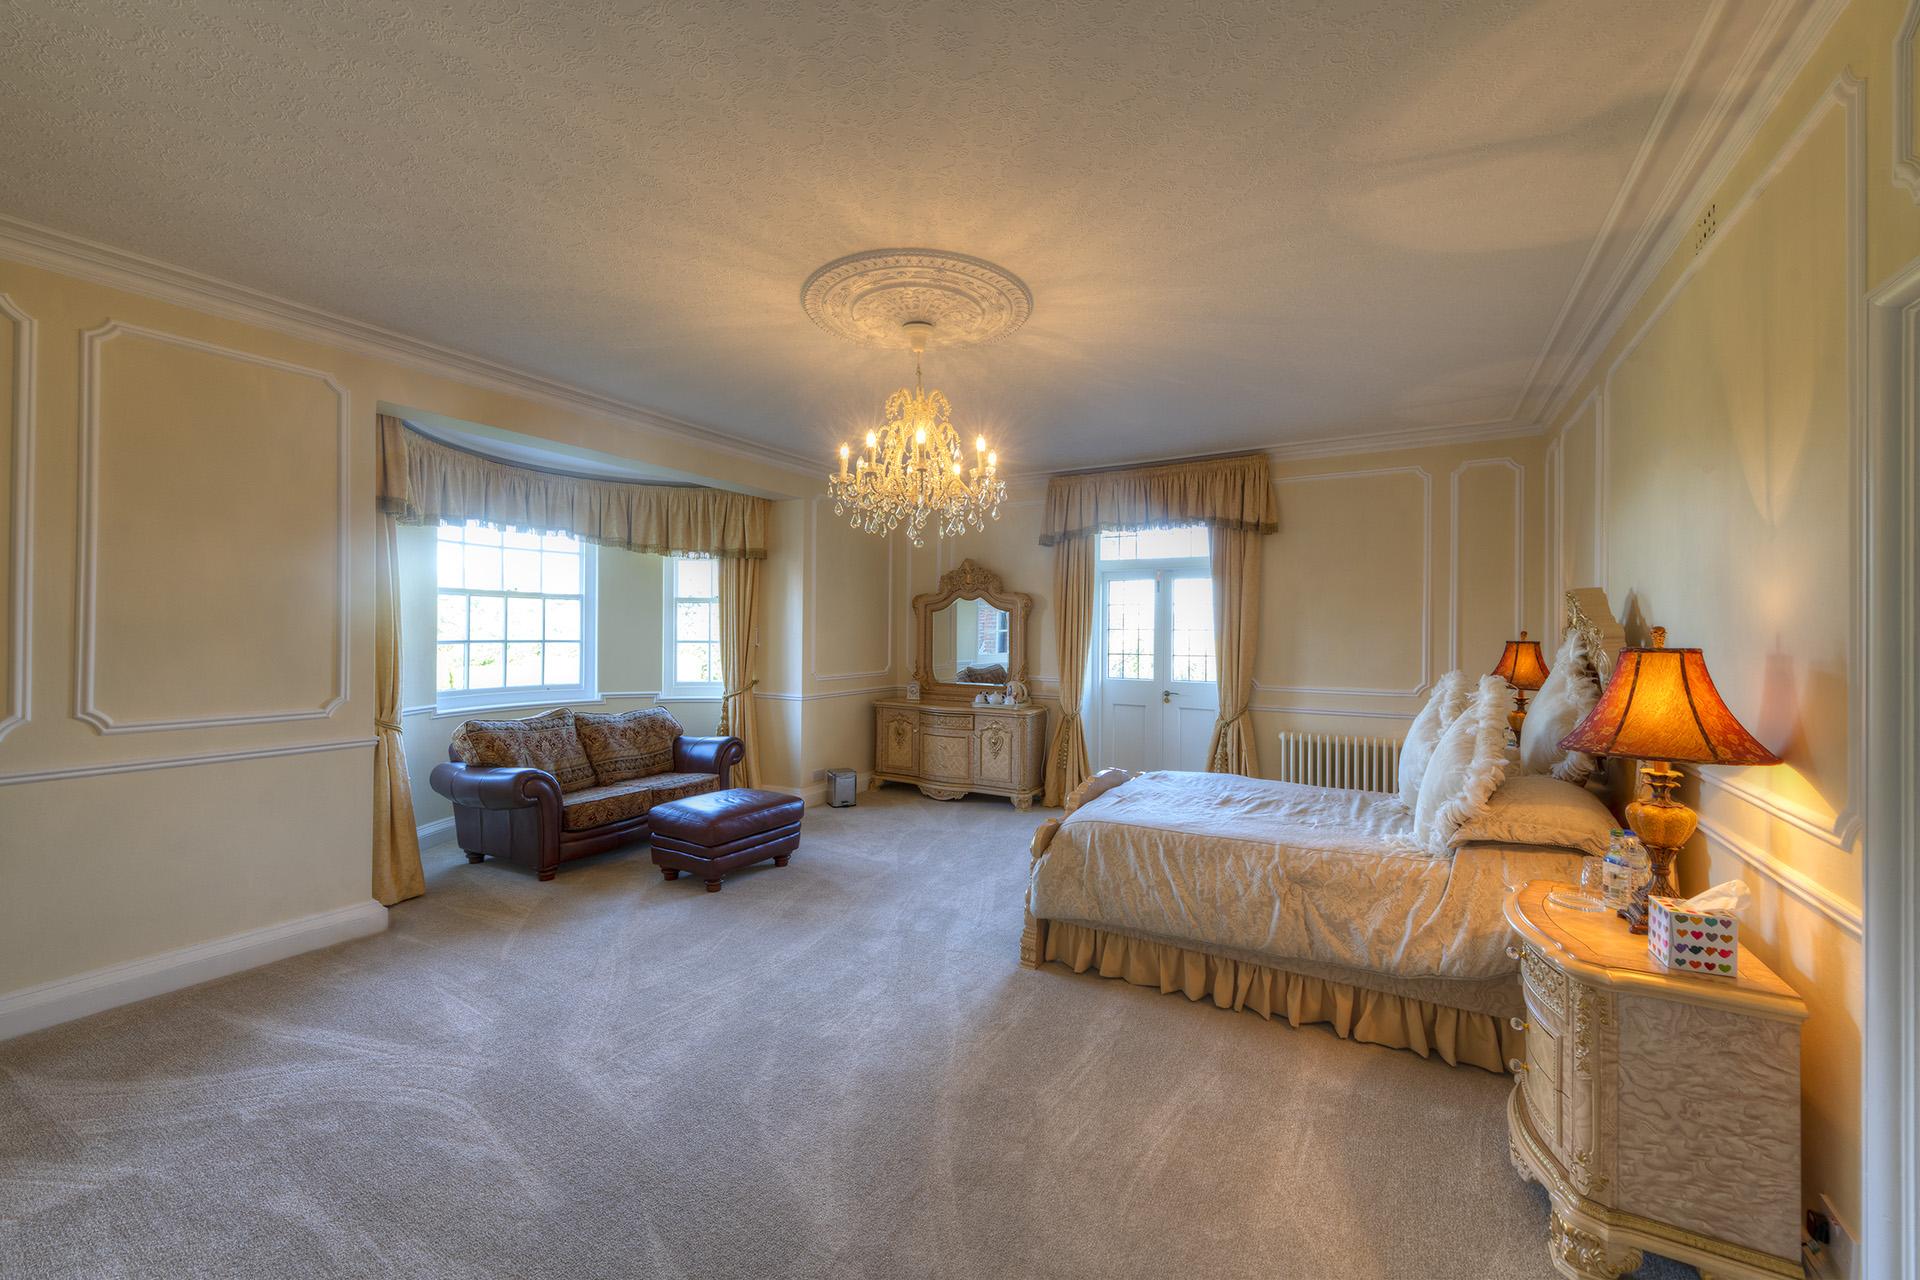 Bridal suite east sussex wedding venue